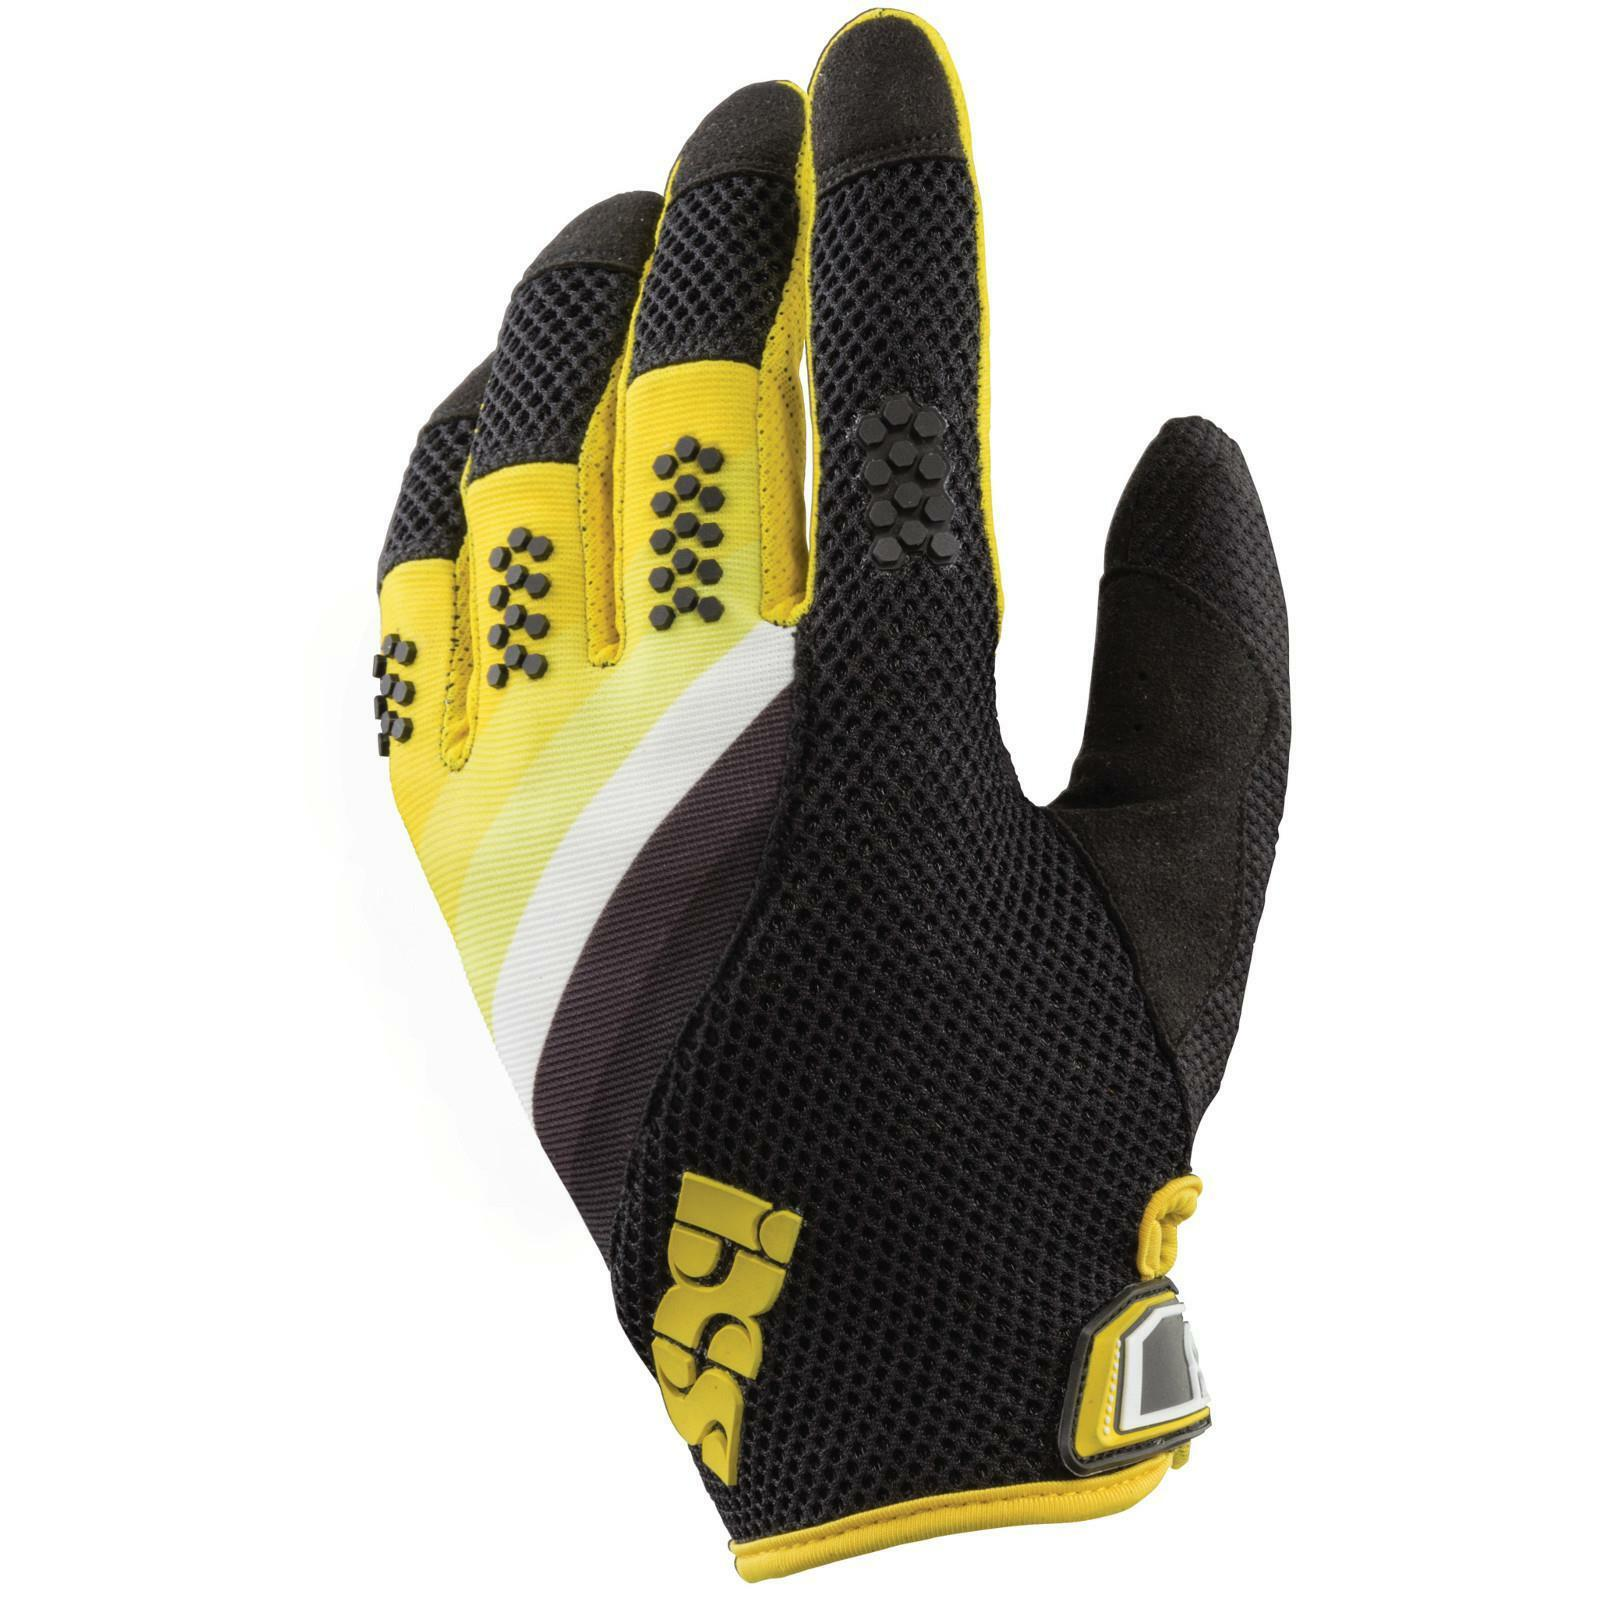 IXS DH-X5.1 Fahrrad Fahrrad Fahrrad Handschuhe Downhill Freeride All Mountain Bike Cross Enduro 3a4ab1